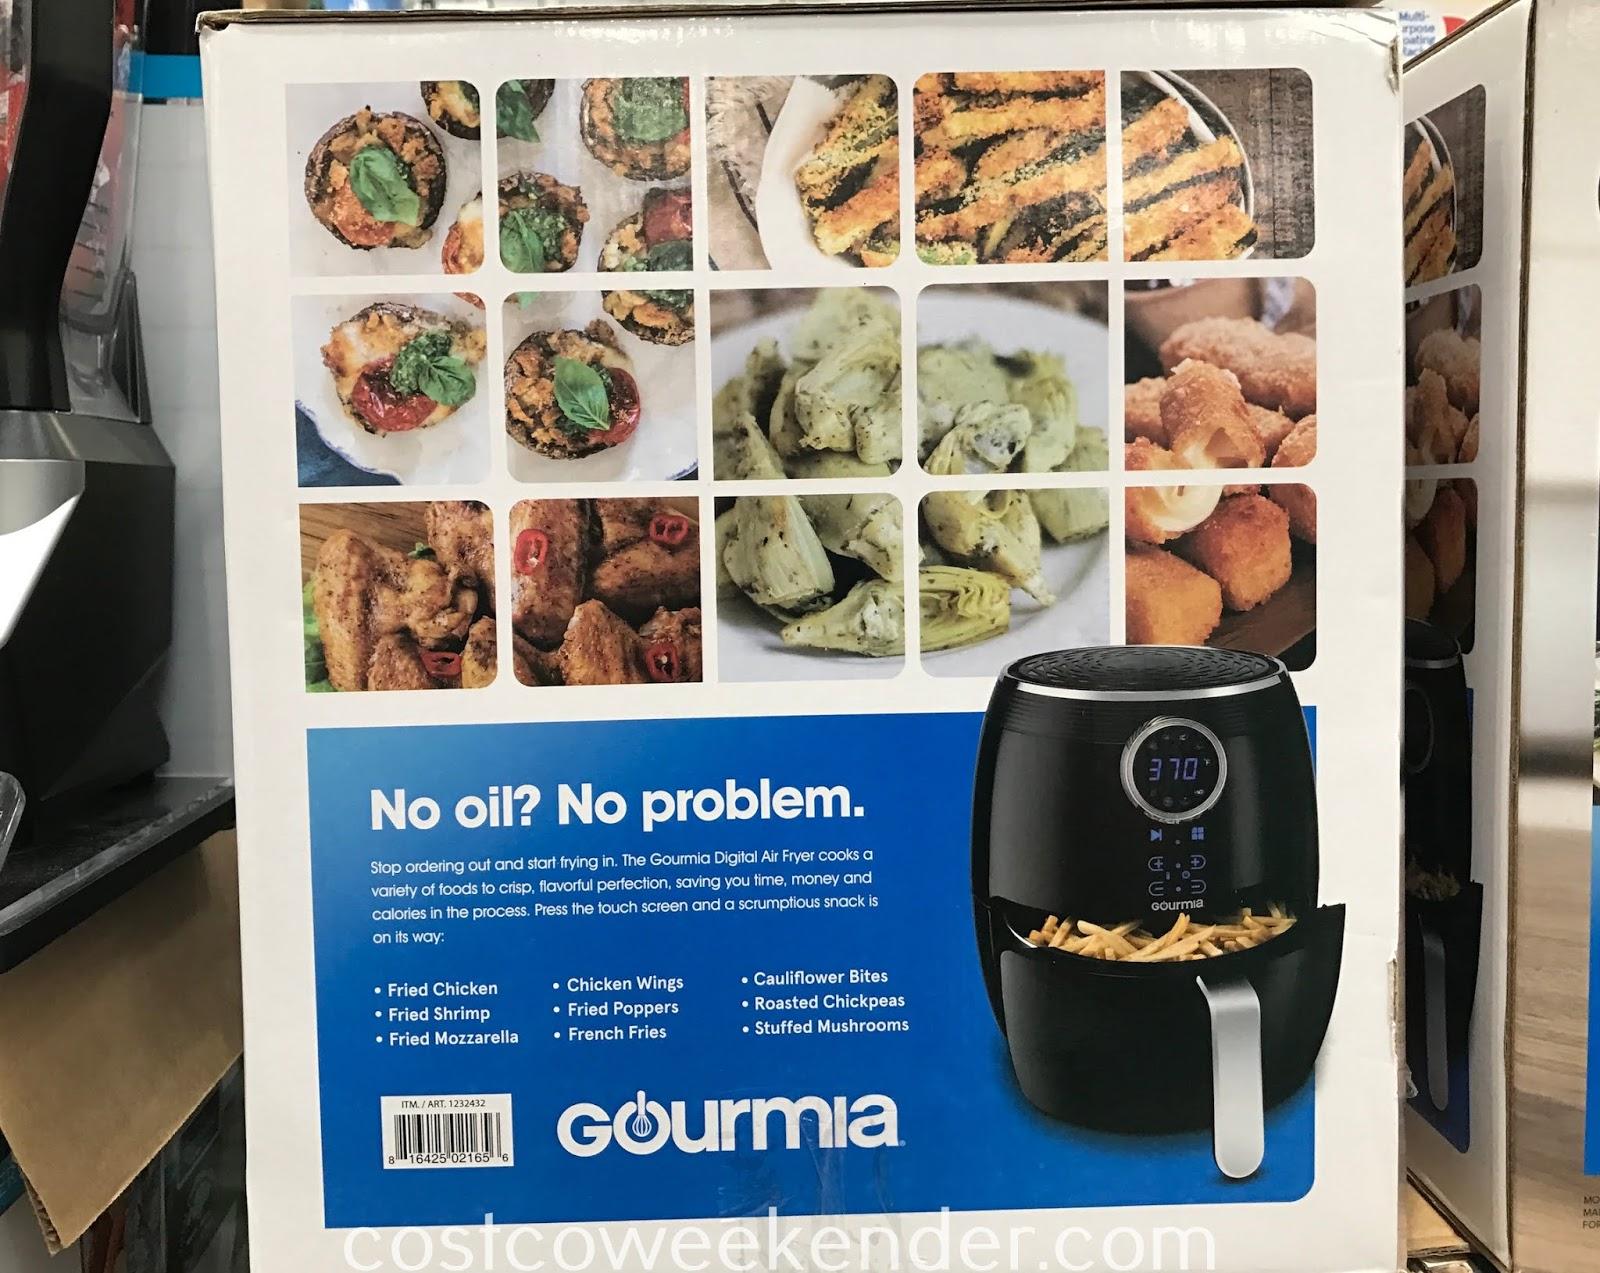 Gourmia 5qt Digital Air Fryer: great for a healthier lifestyle